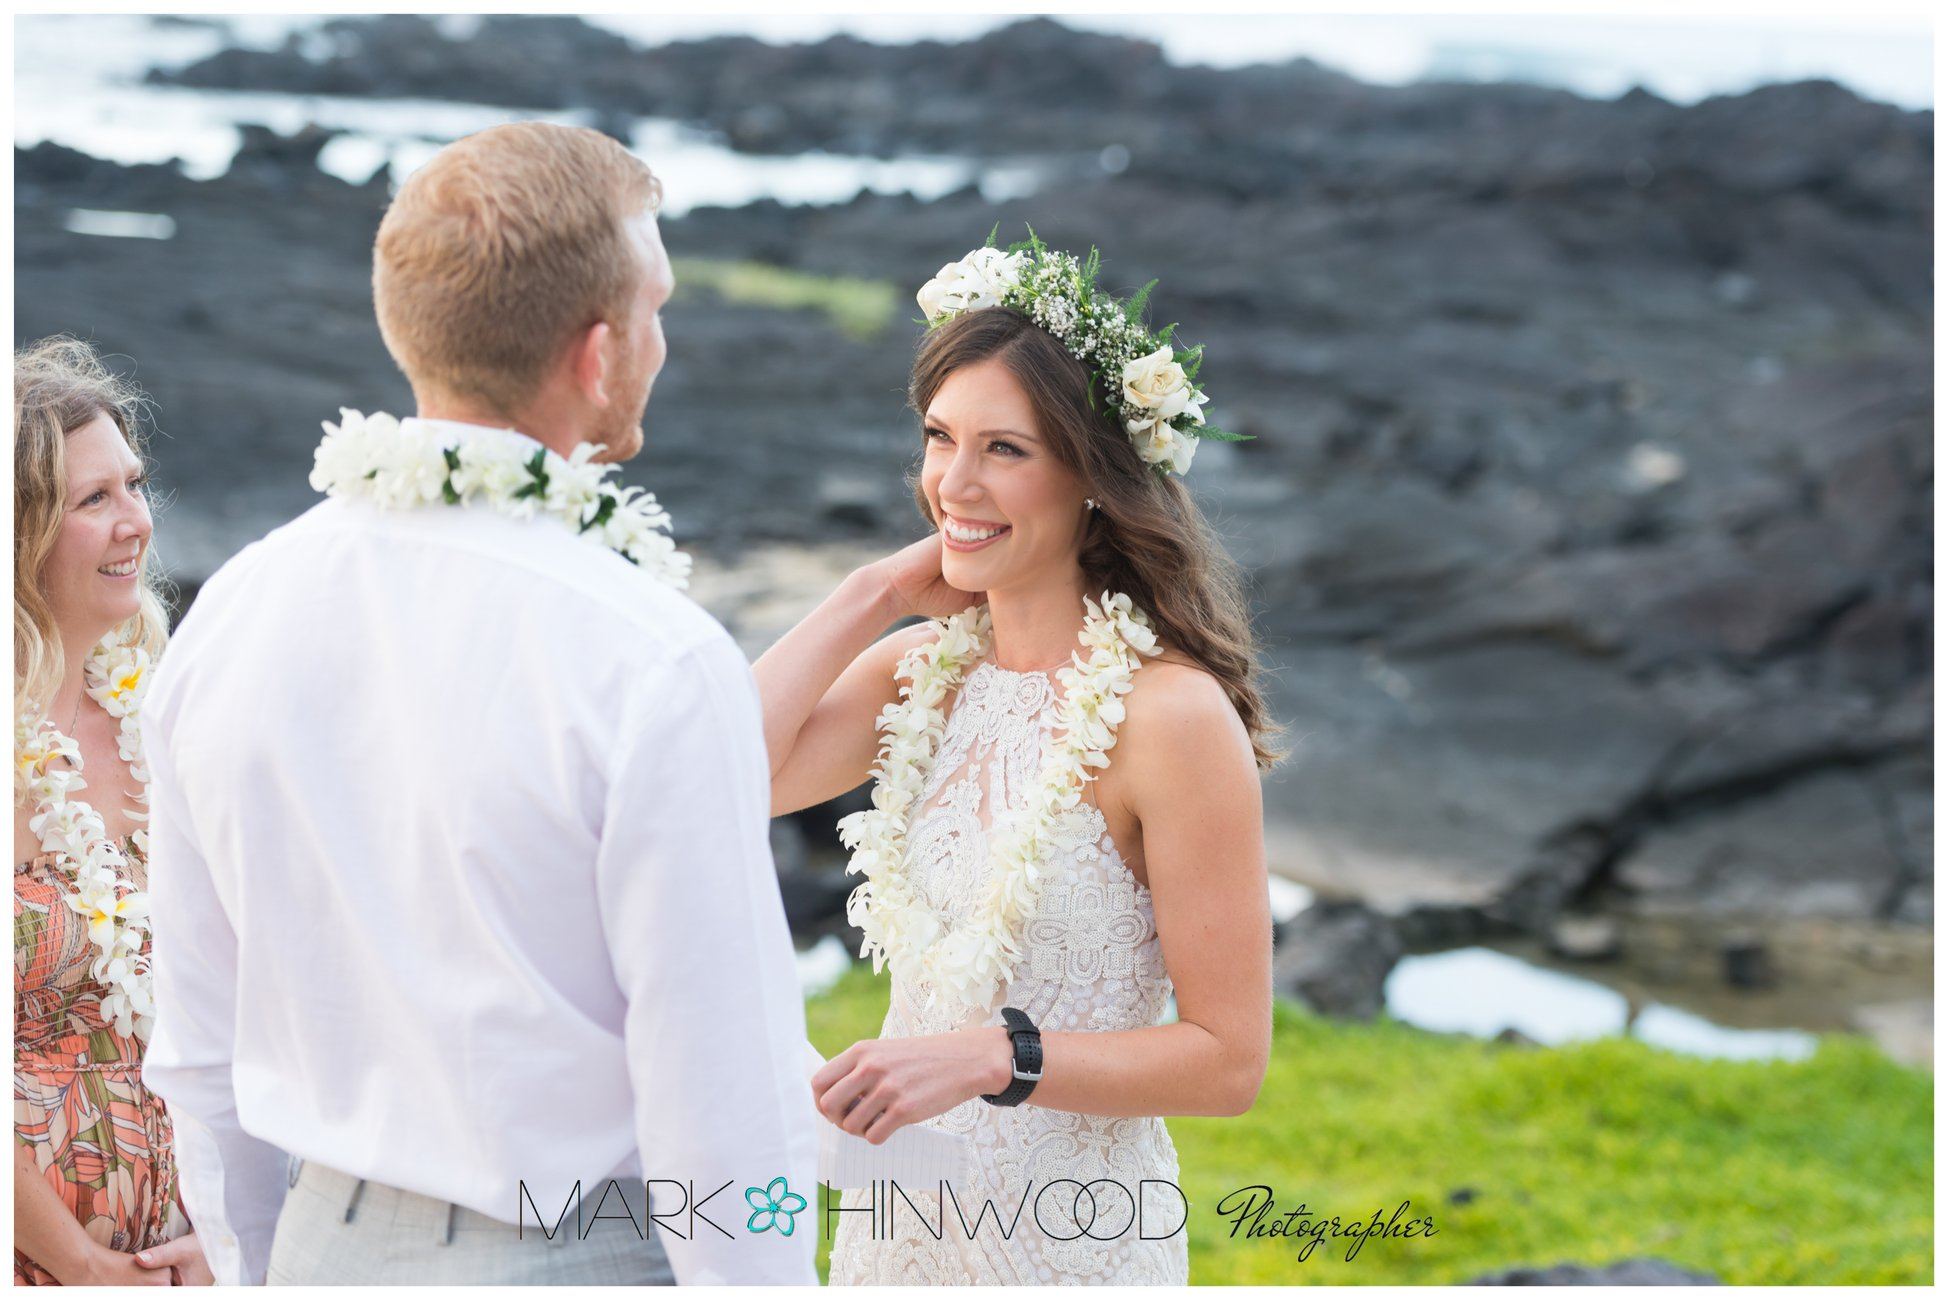 Top Kailua Kona Photographers 10